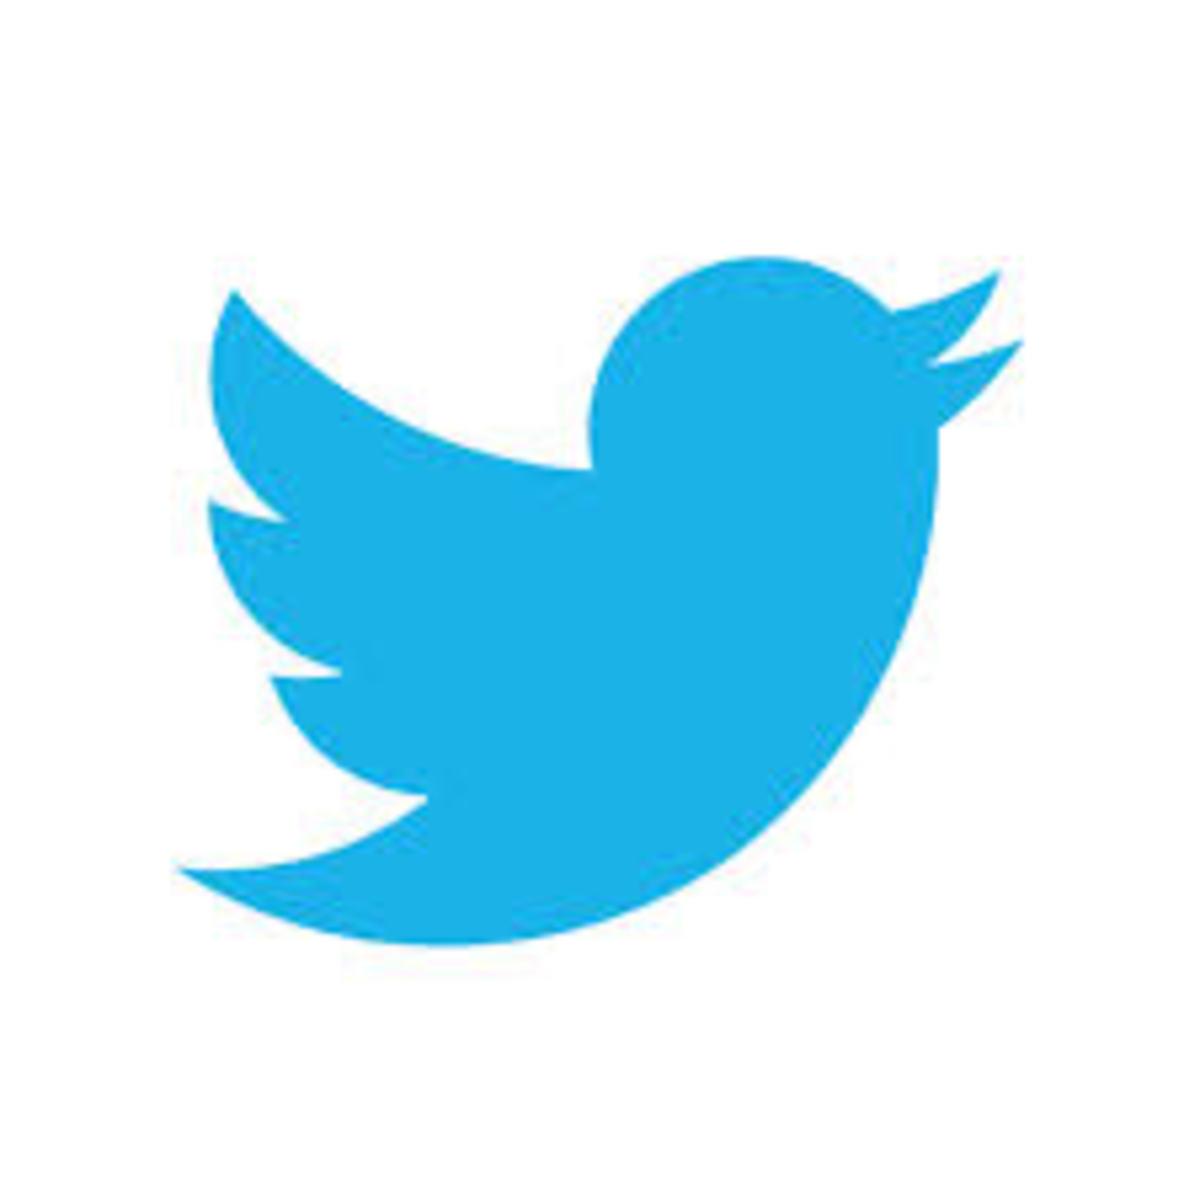 Twitter, I love you.